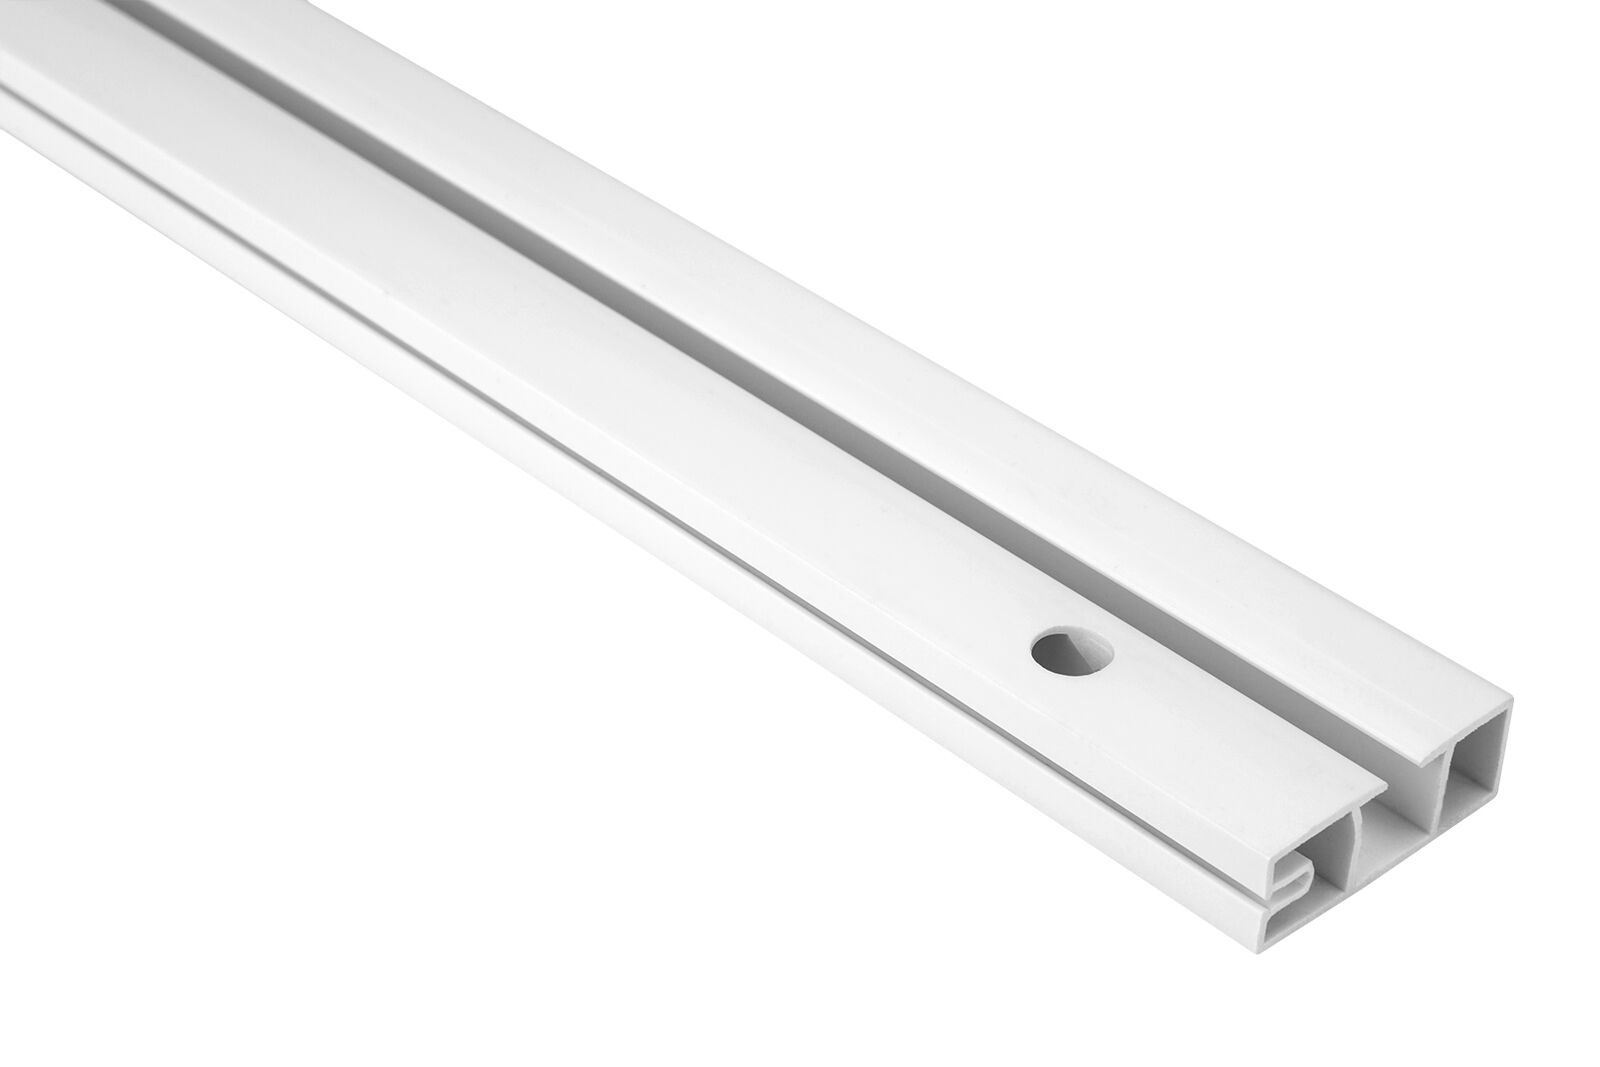 30 Metri 1-läufige PVC Binario per Tenda Tenda a Pannello Tavole per Tende, OM-1